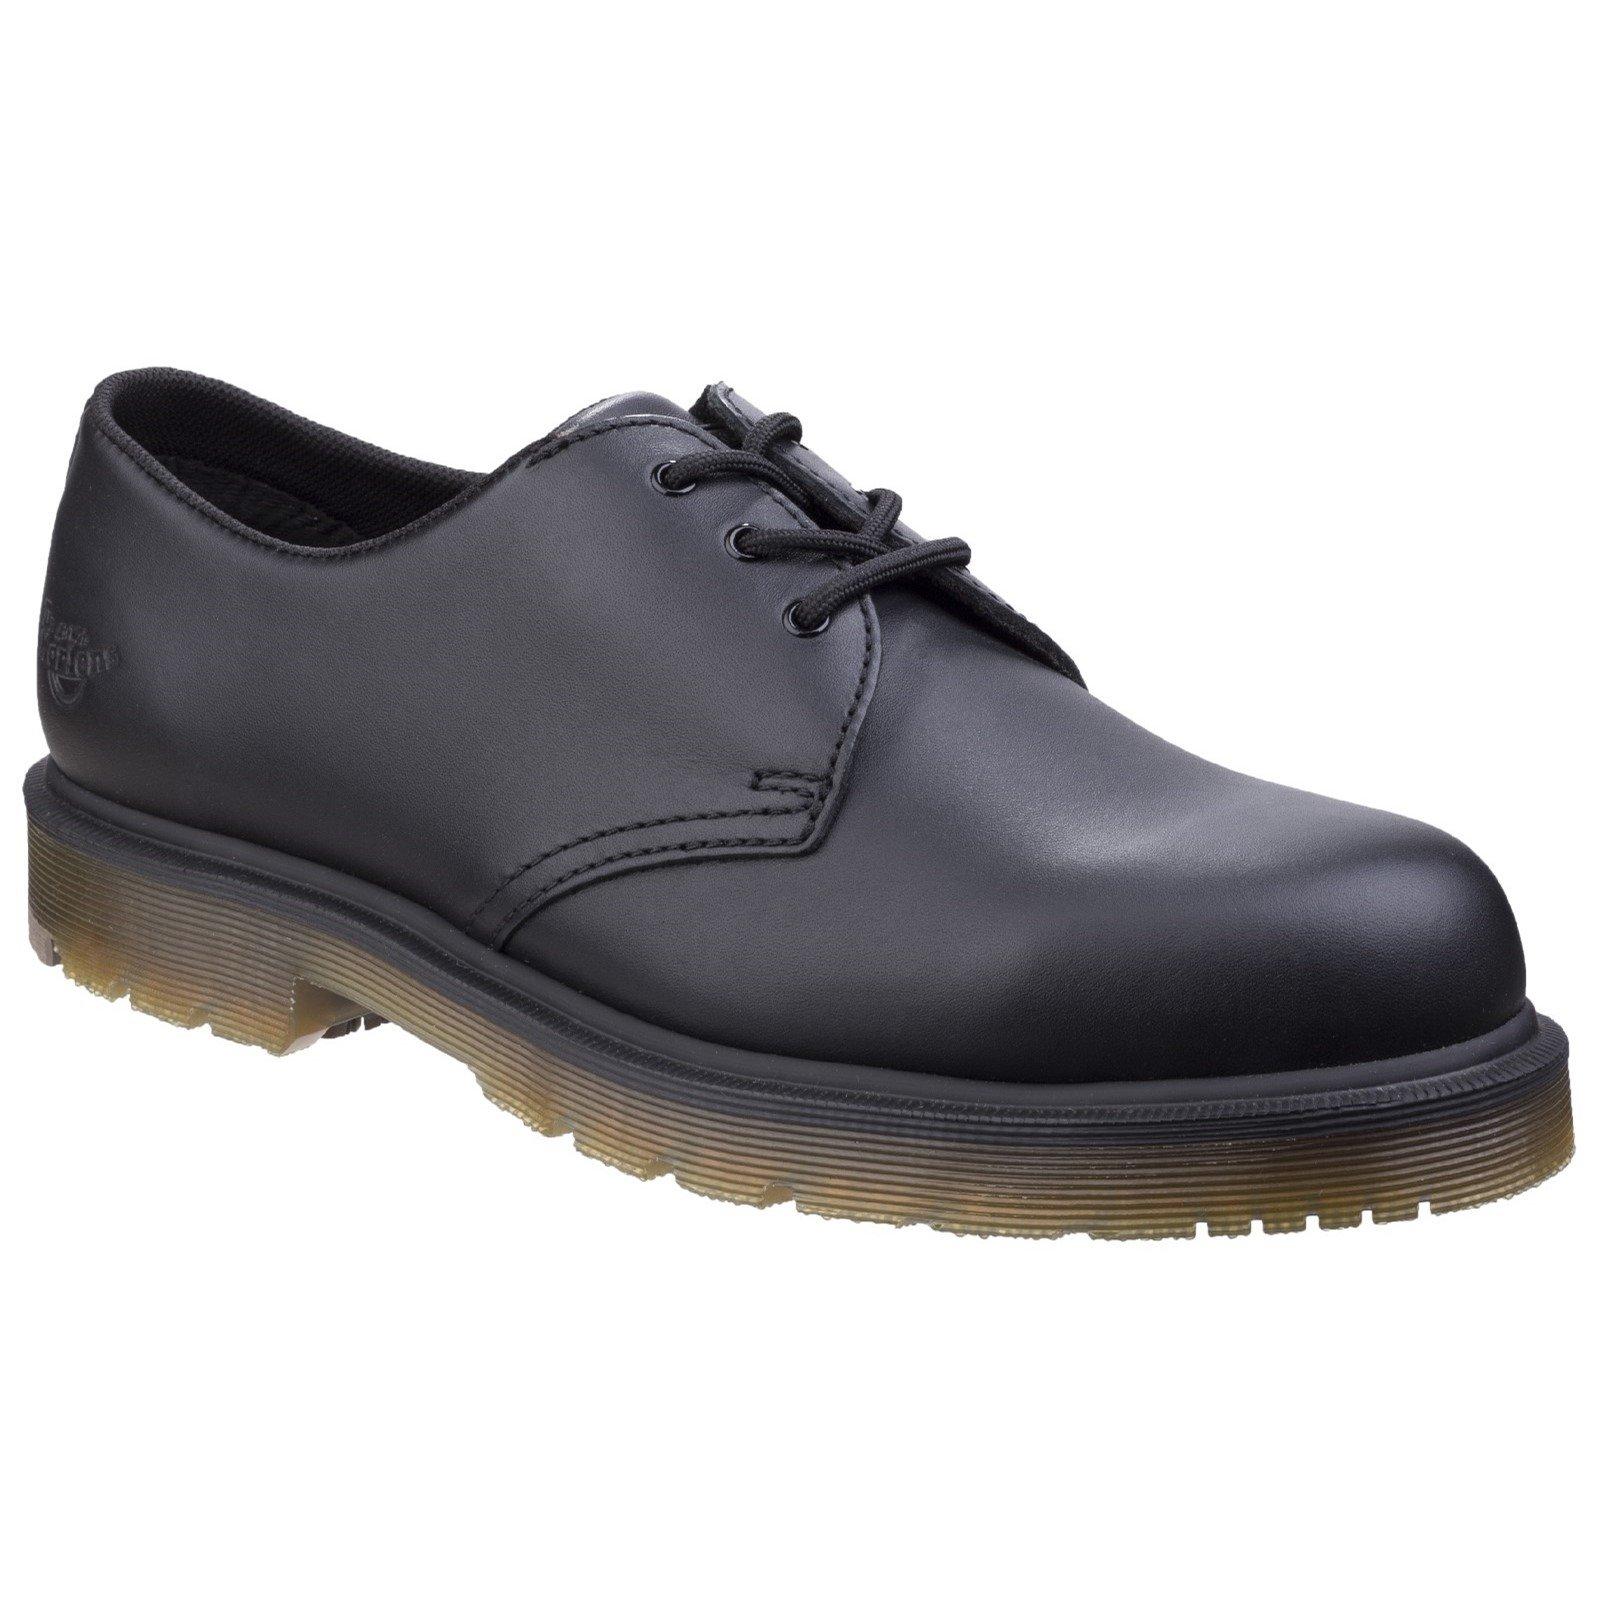 Dr Martens Men's Arlington NS Derby Shoe Black 26781 - Black Industrial Full Grain 7